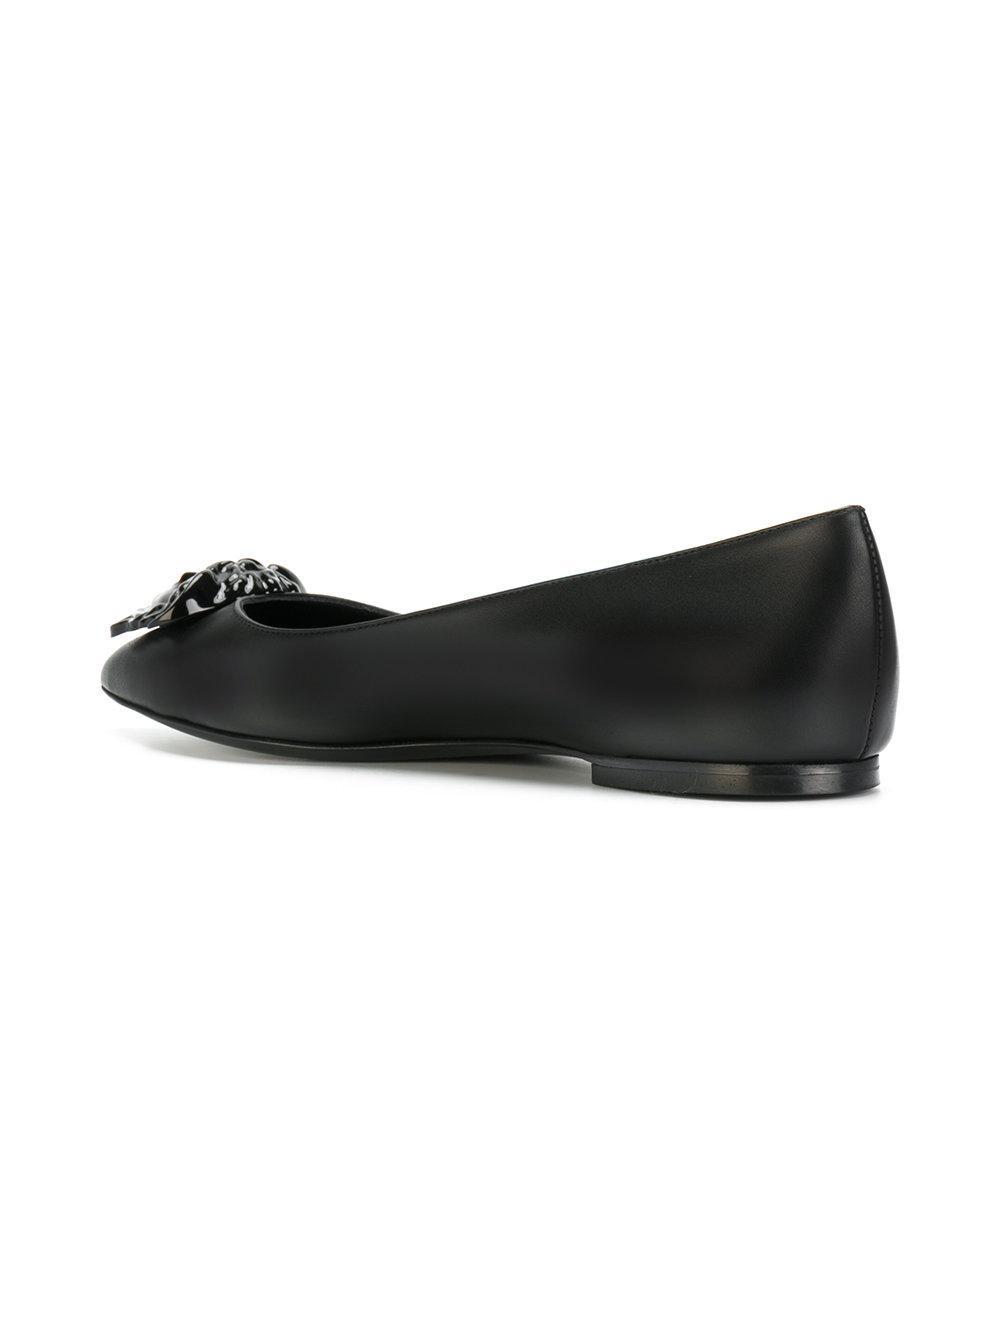 cbbb60010a4 Lyst - Versace Medusa Palazzo Ballerina Shoes in Black